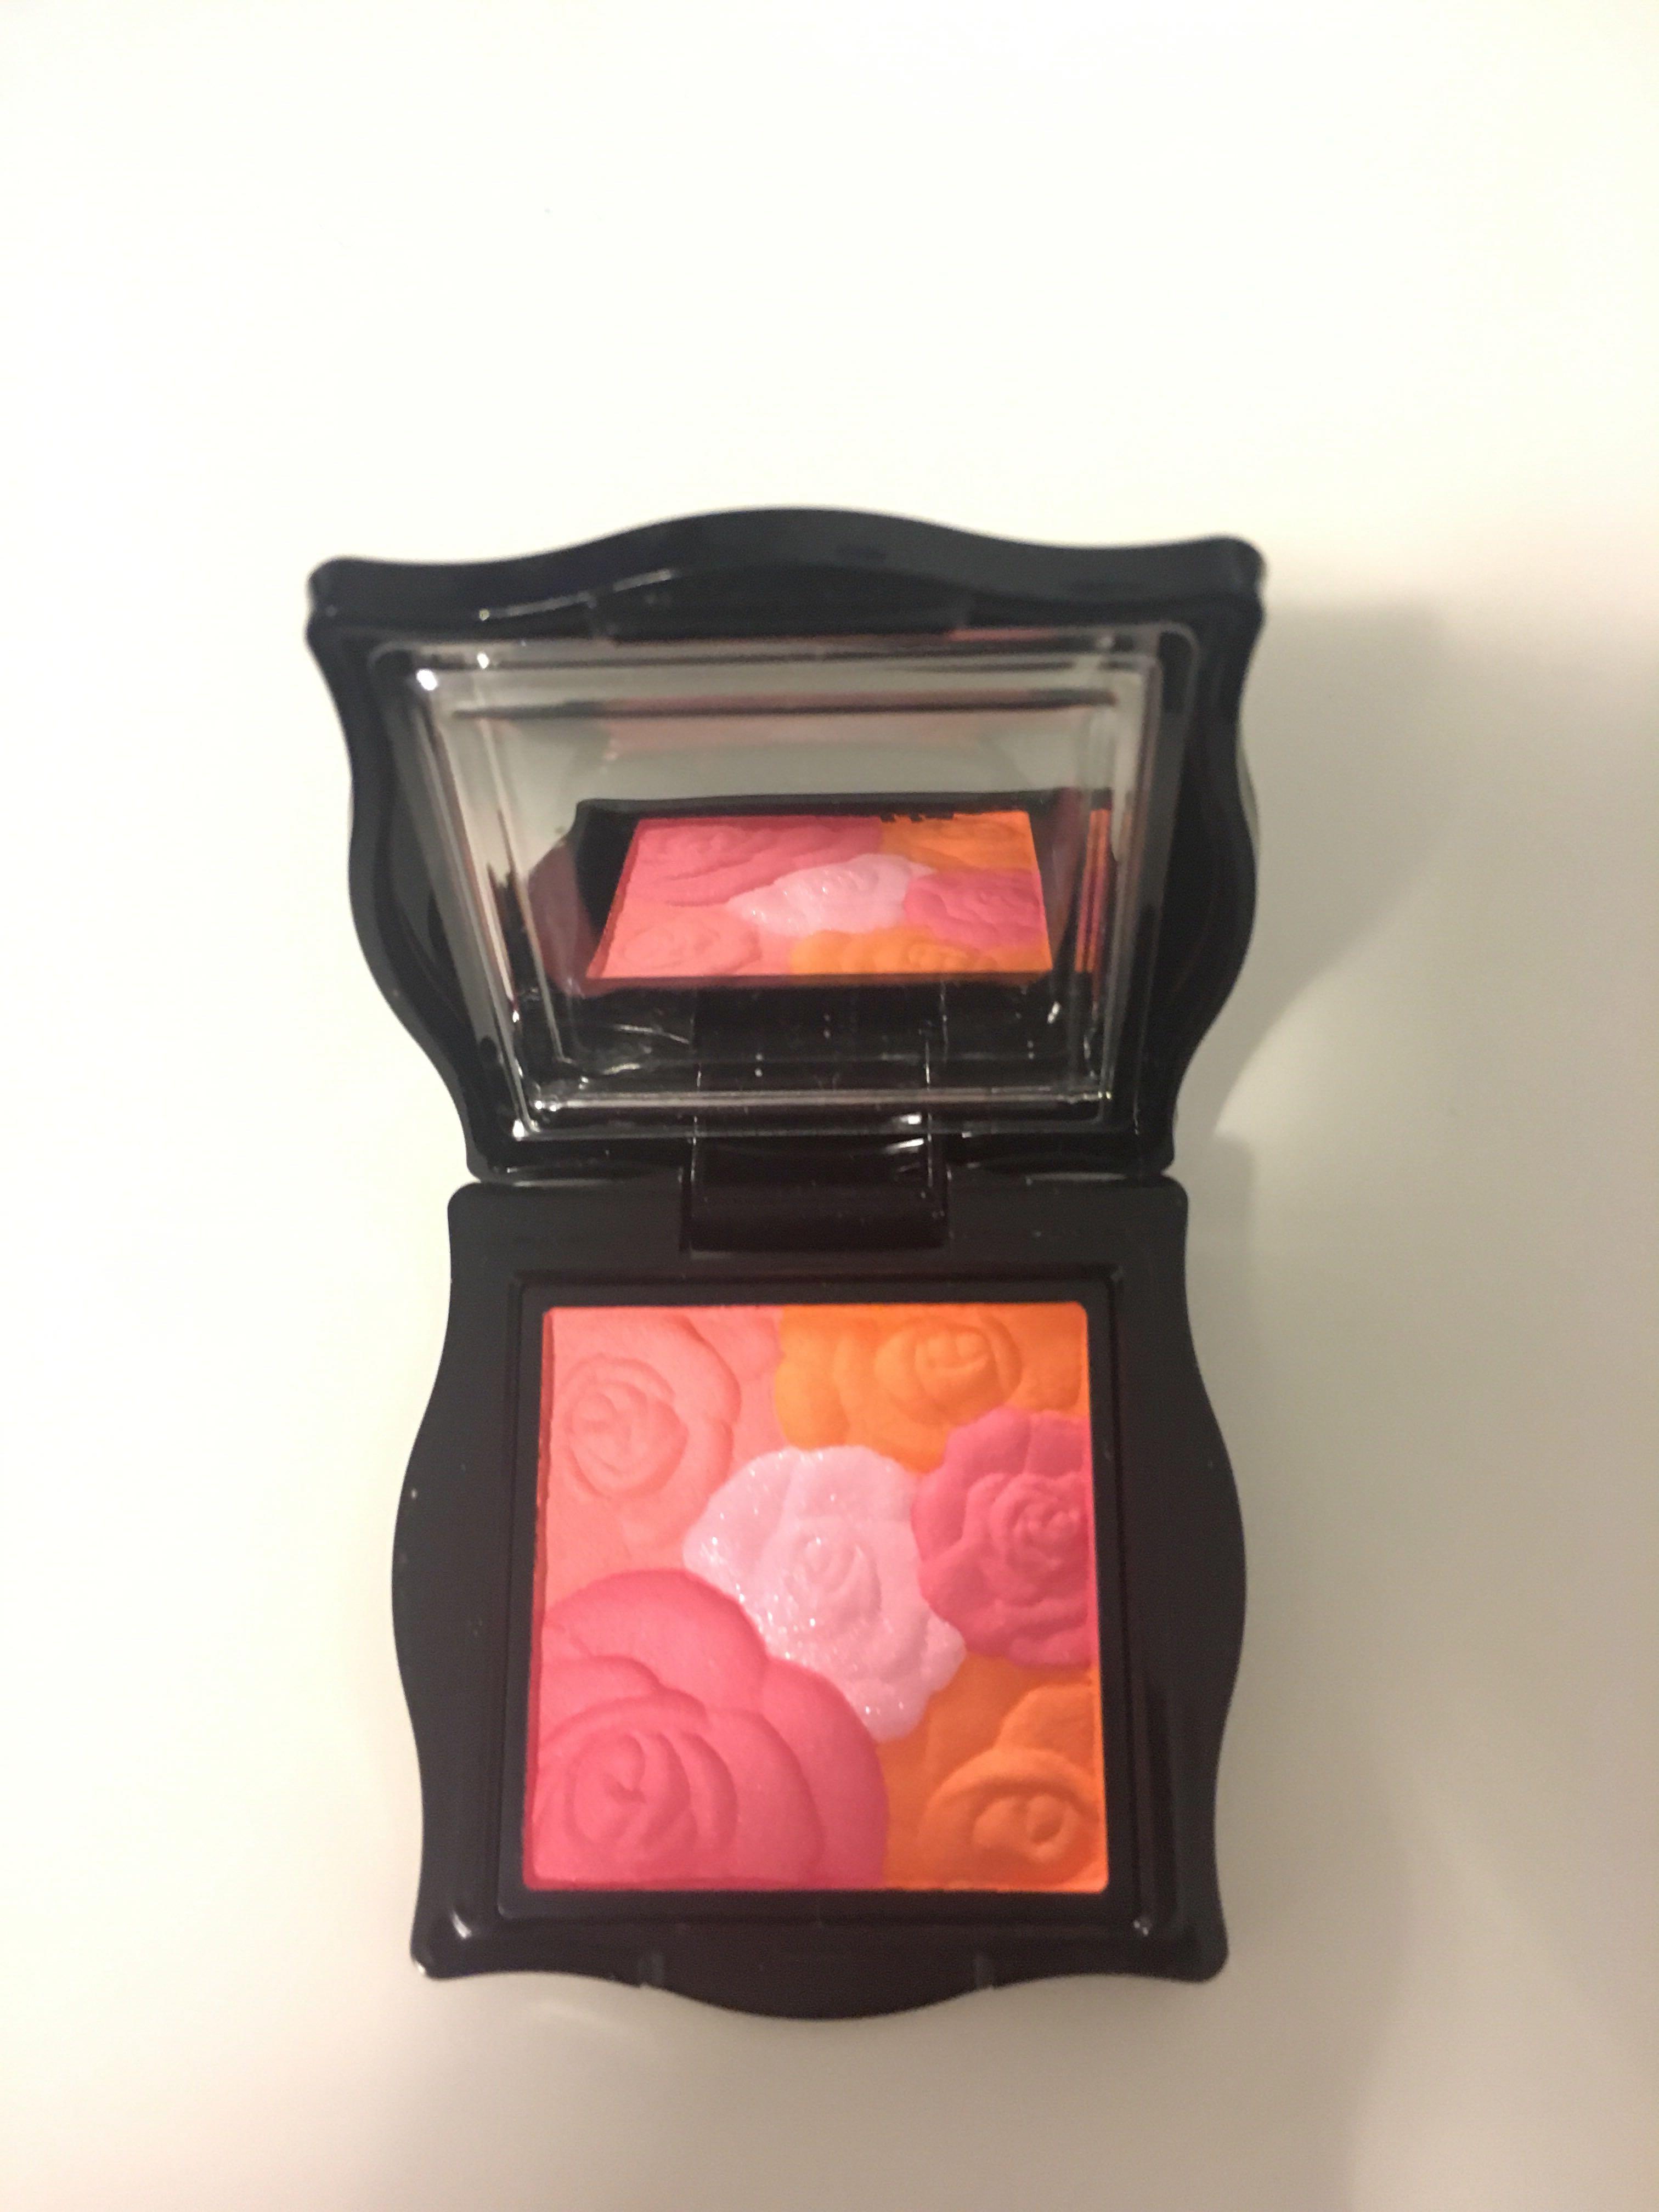 Anna Sui #301 blush